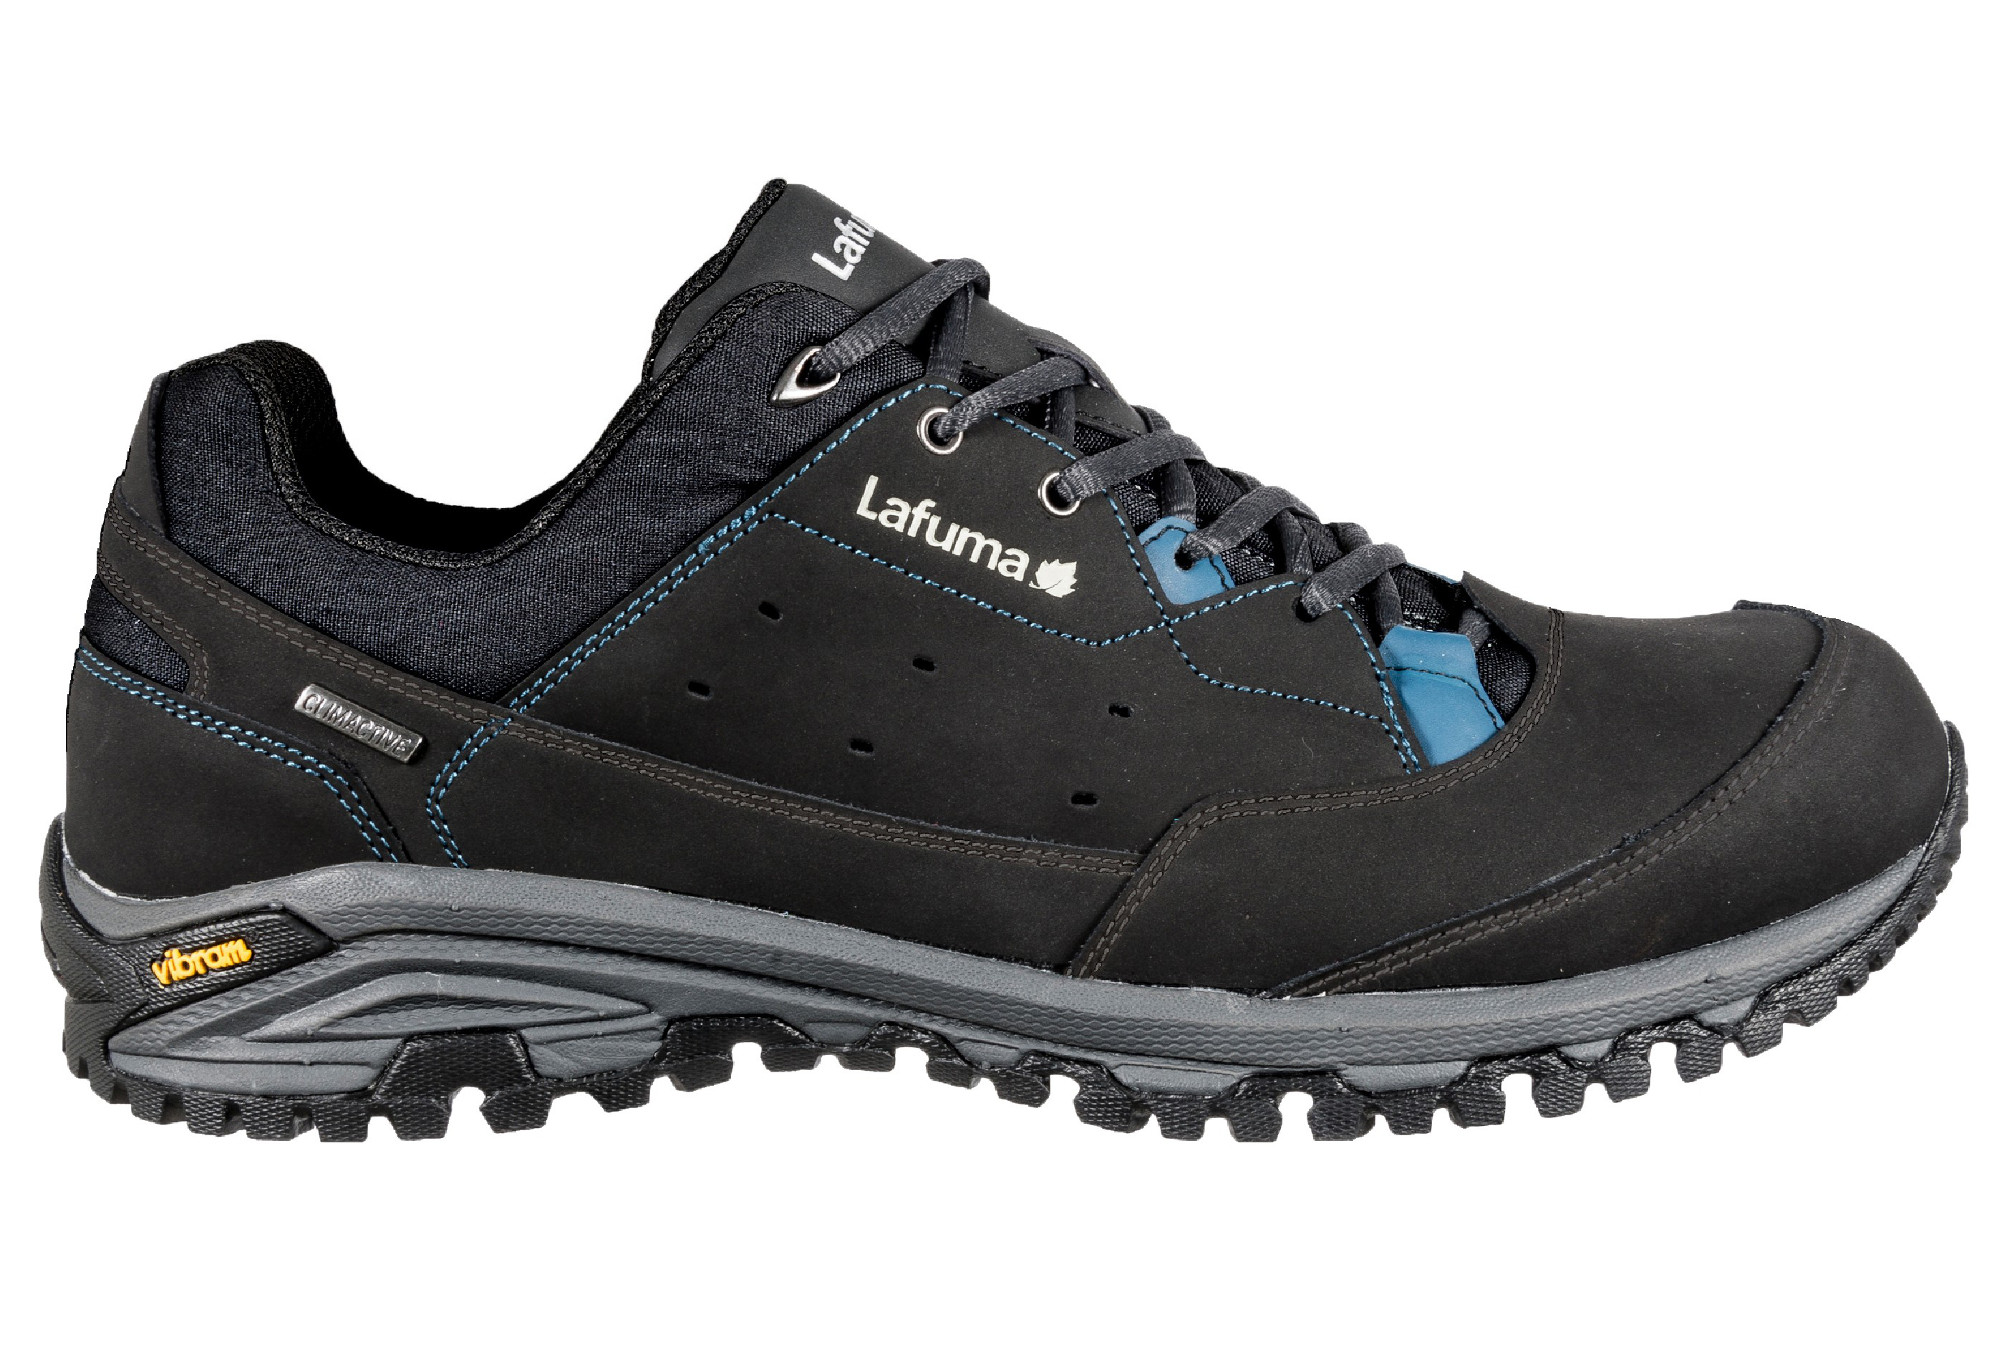 bc0a413a0b0 Chaussures de Randonnée Lafuma Aneto Noir